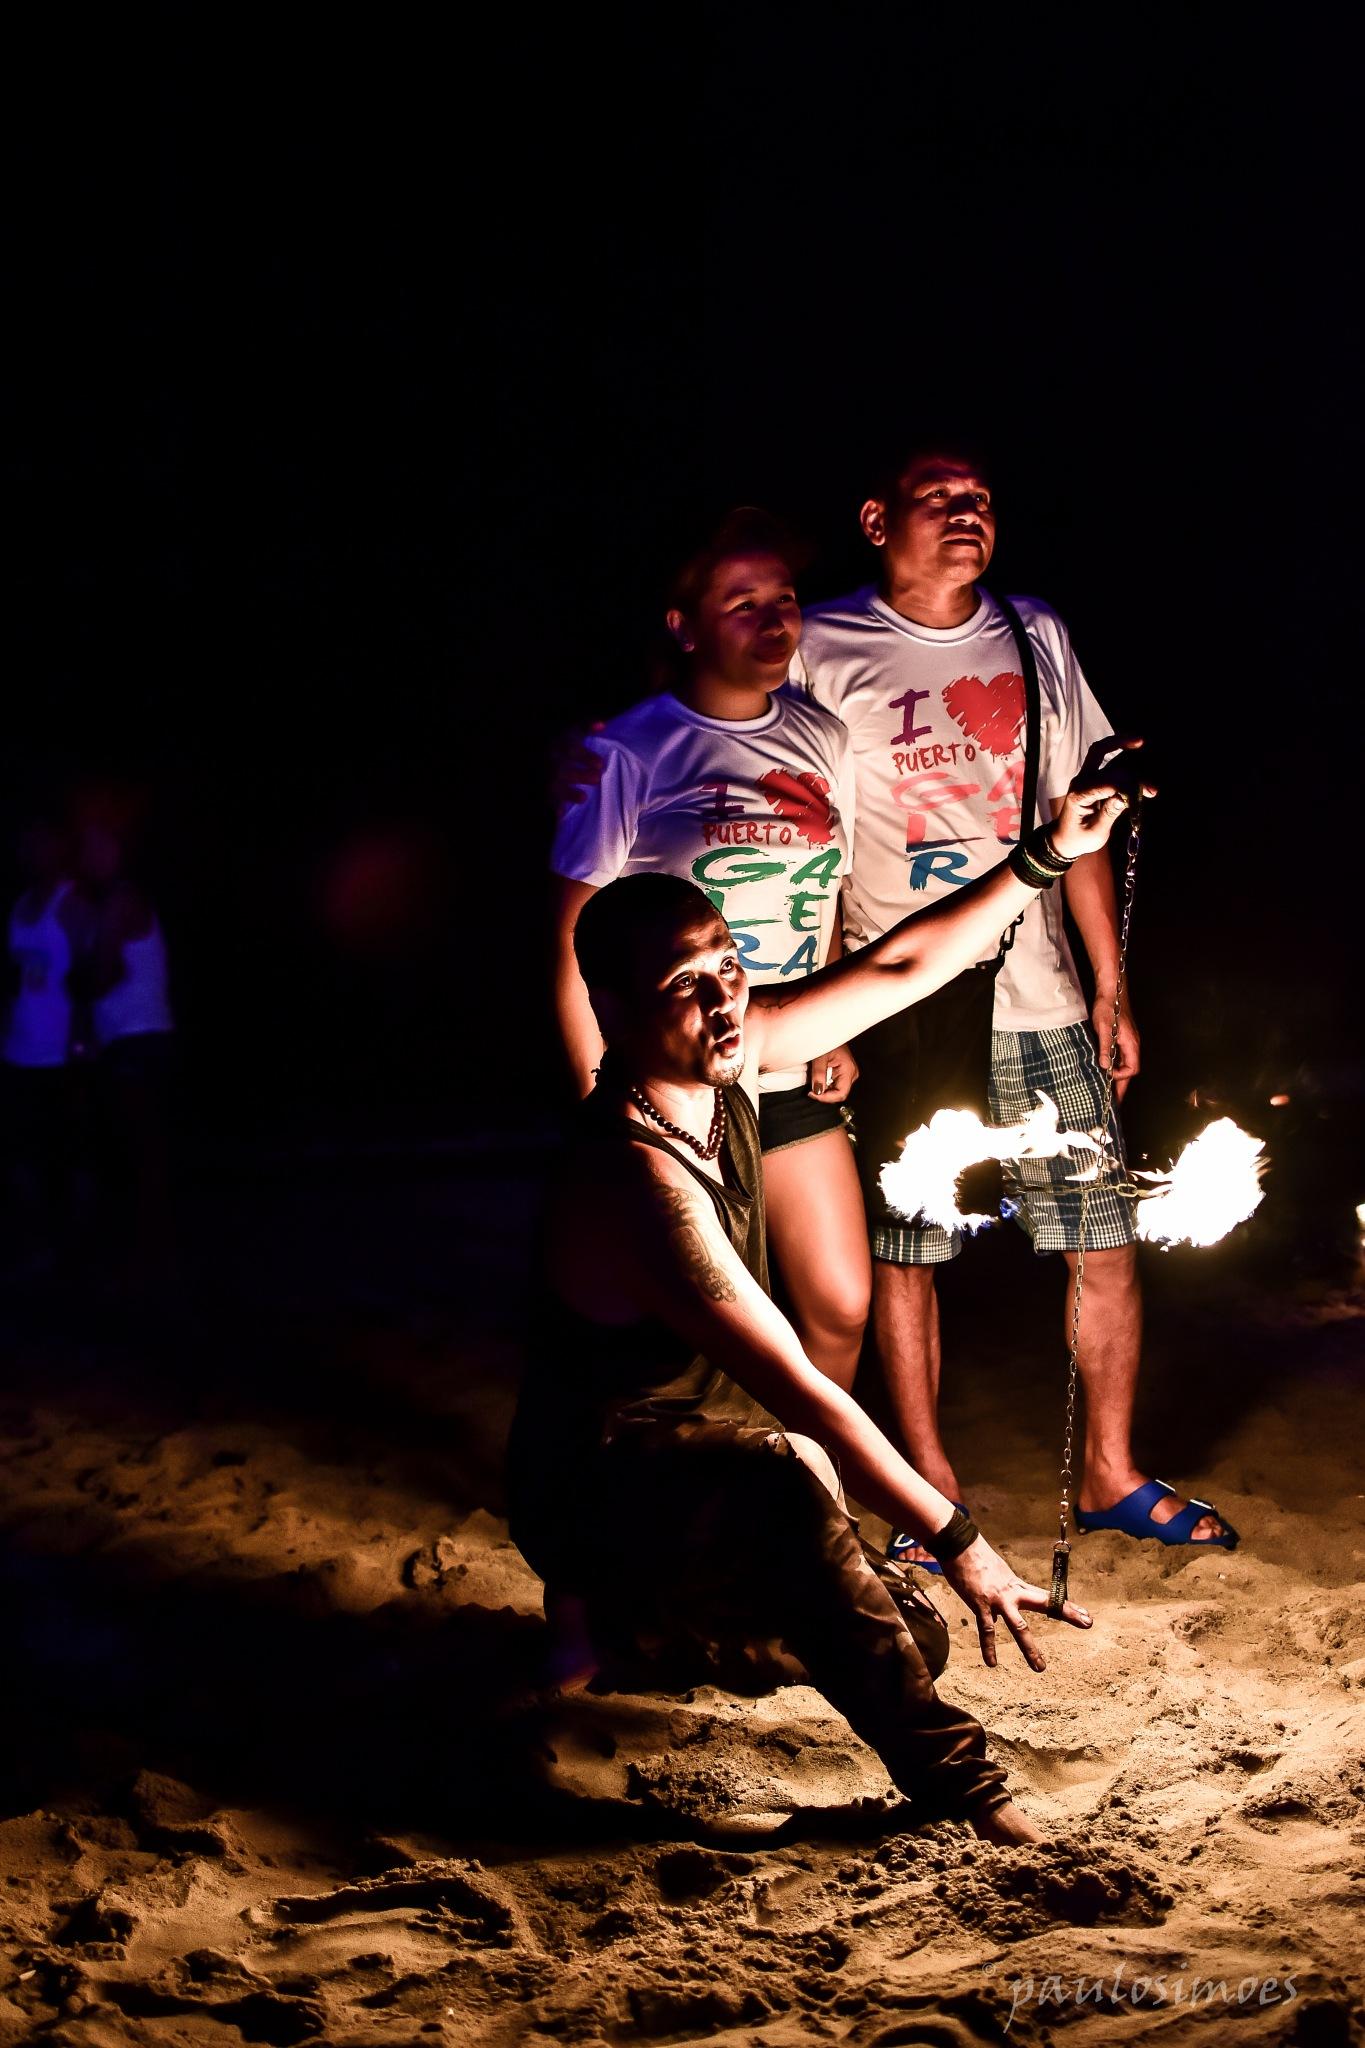 Nights on fire  by Paulo Nix